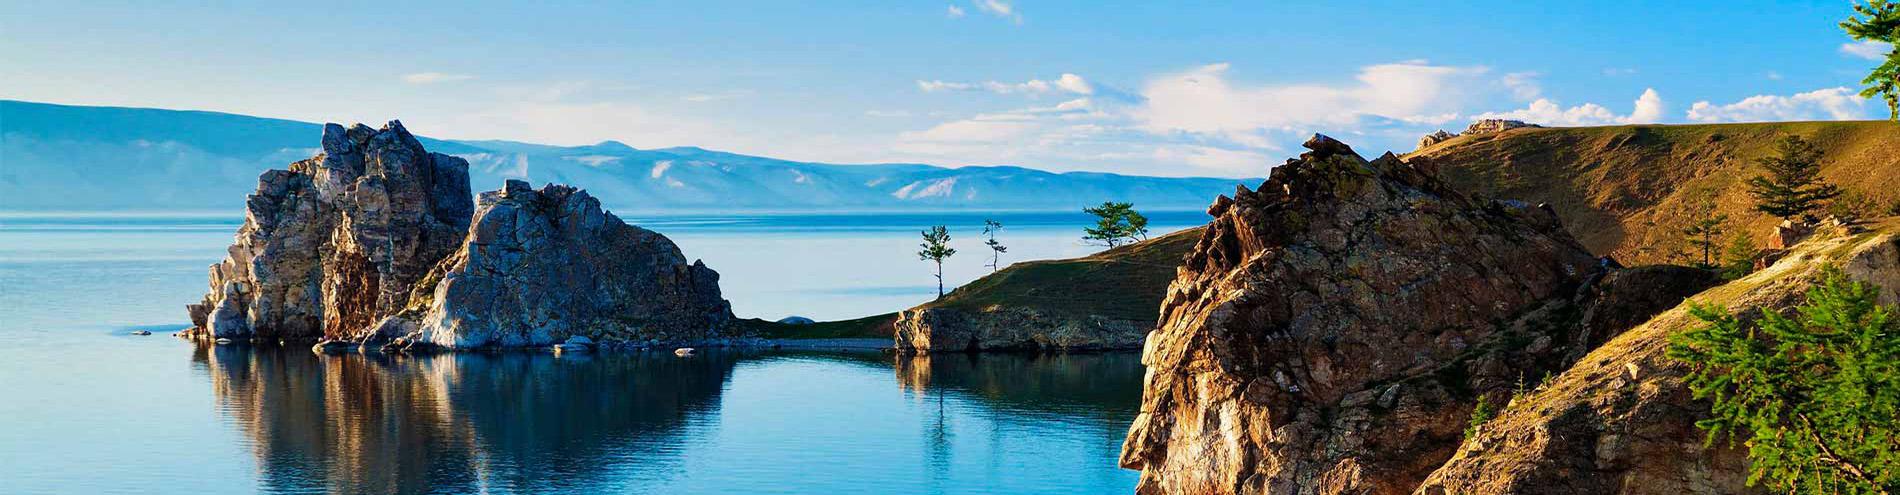 Туры на Байкал со скидкой 10%